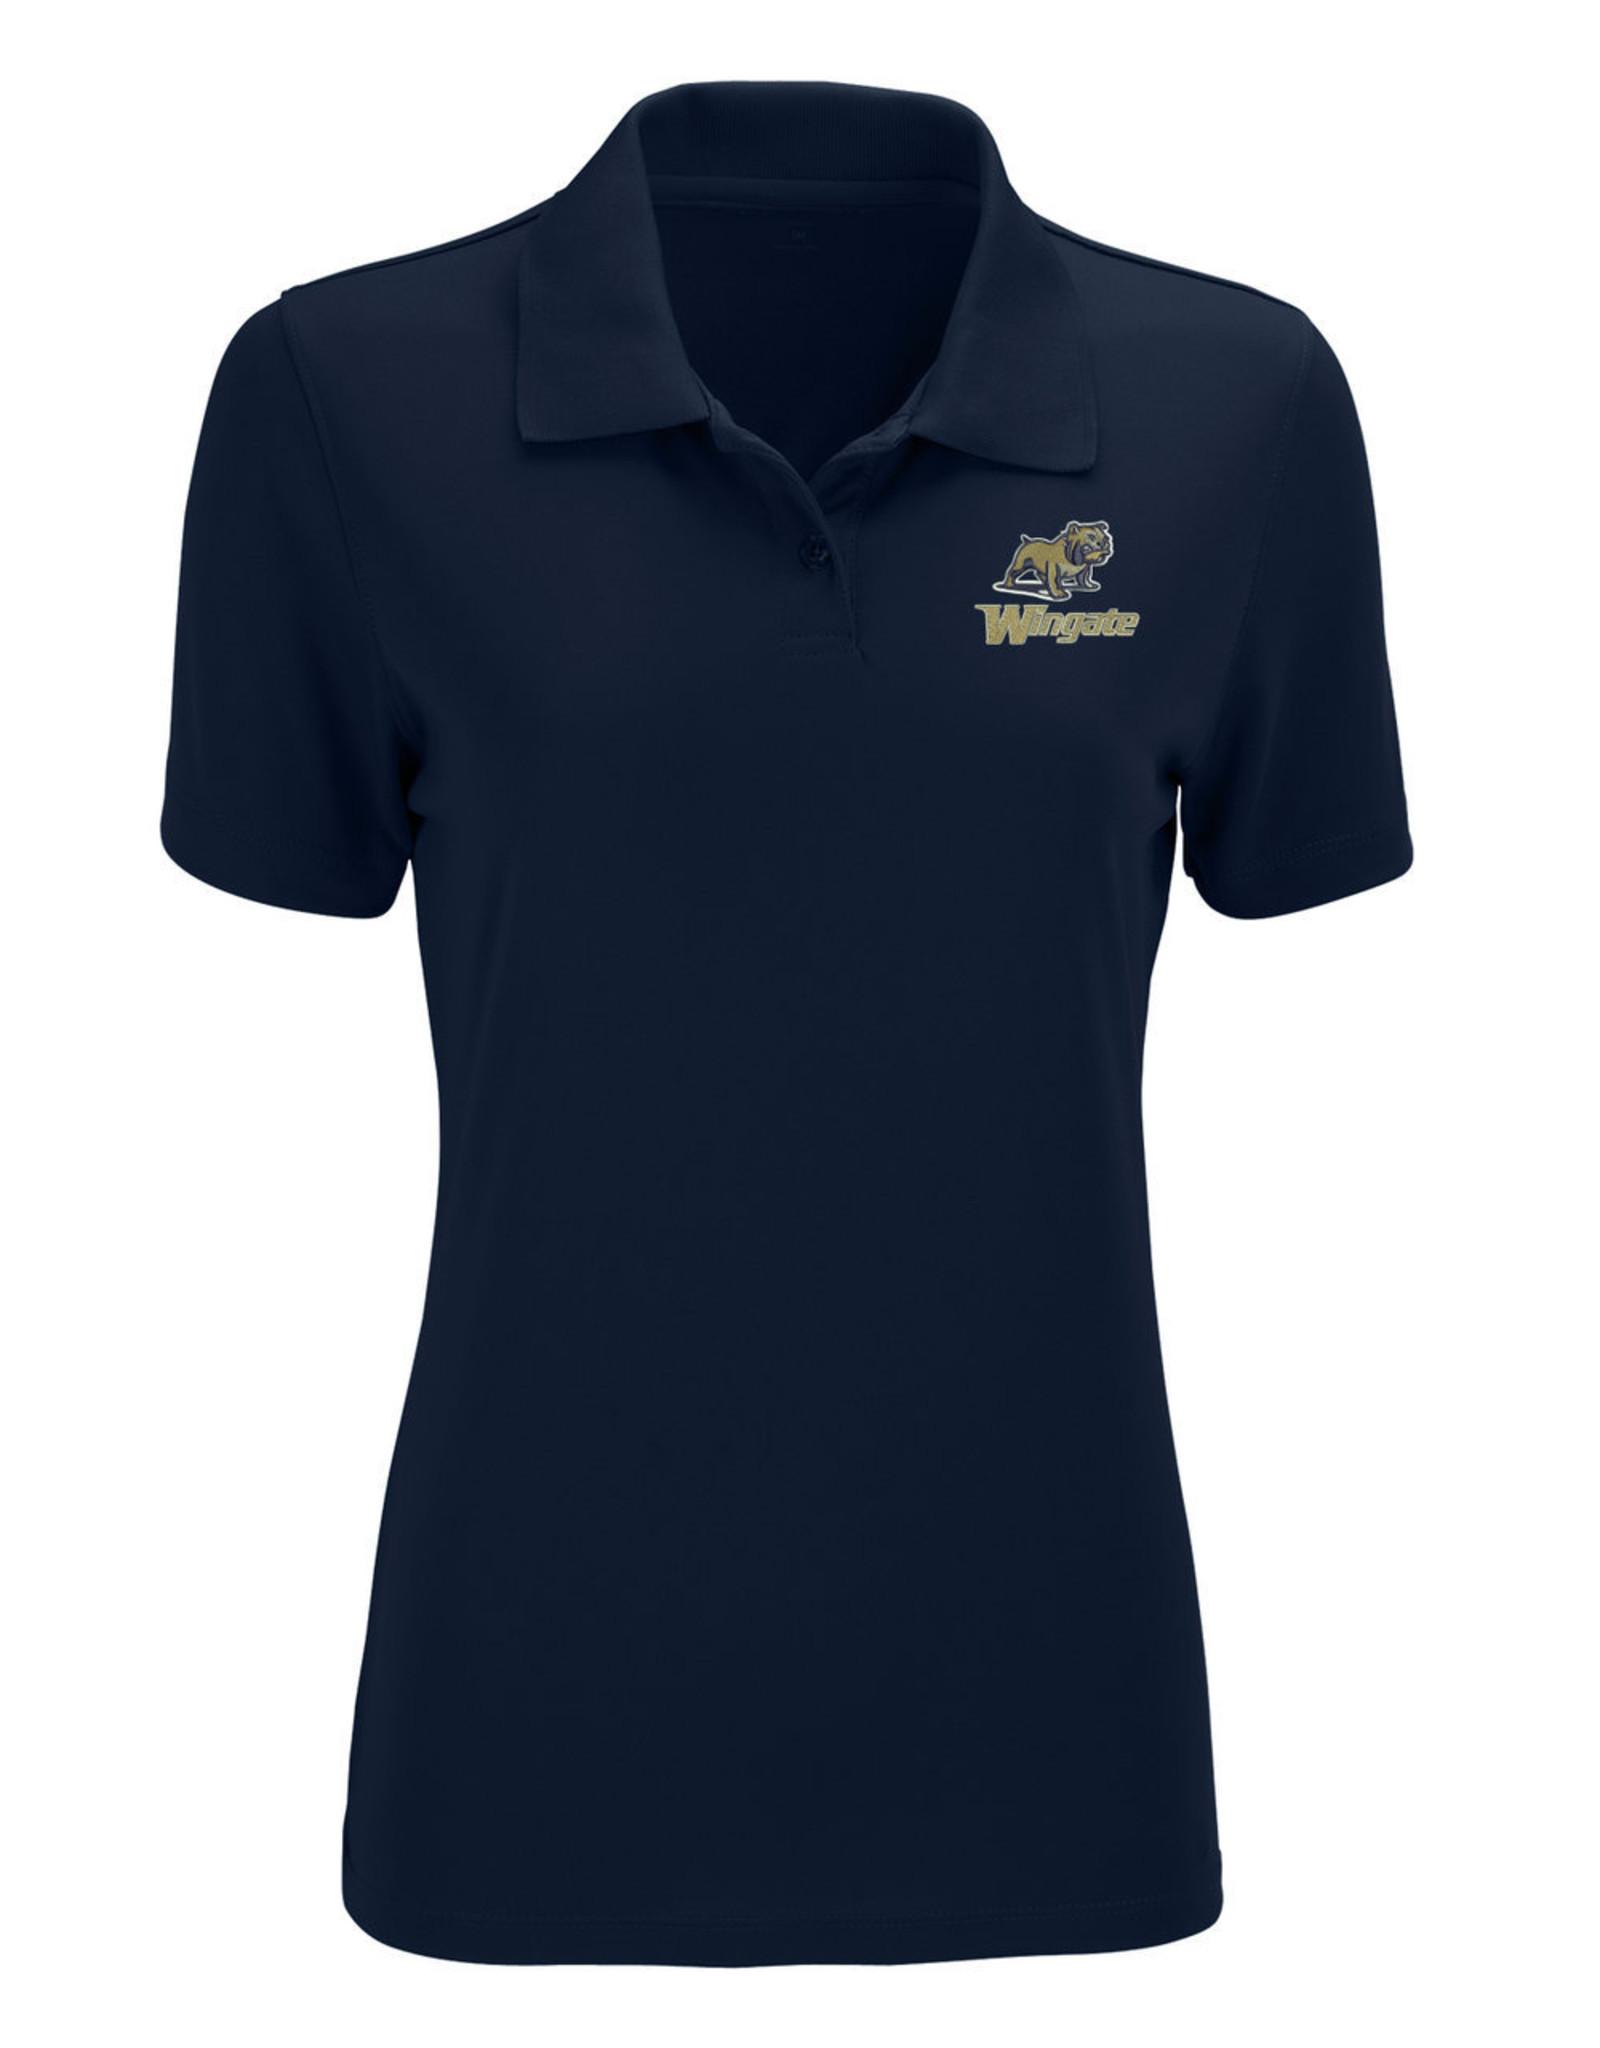 Vansport Ladies Navy Polo